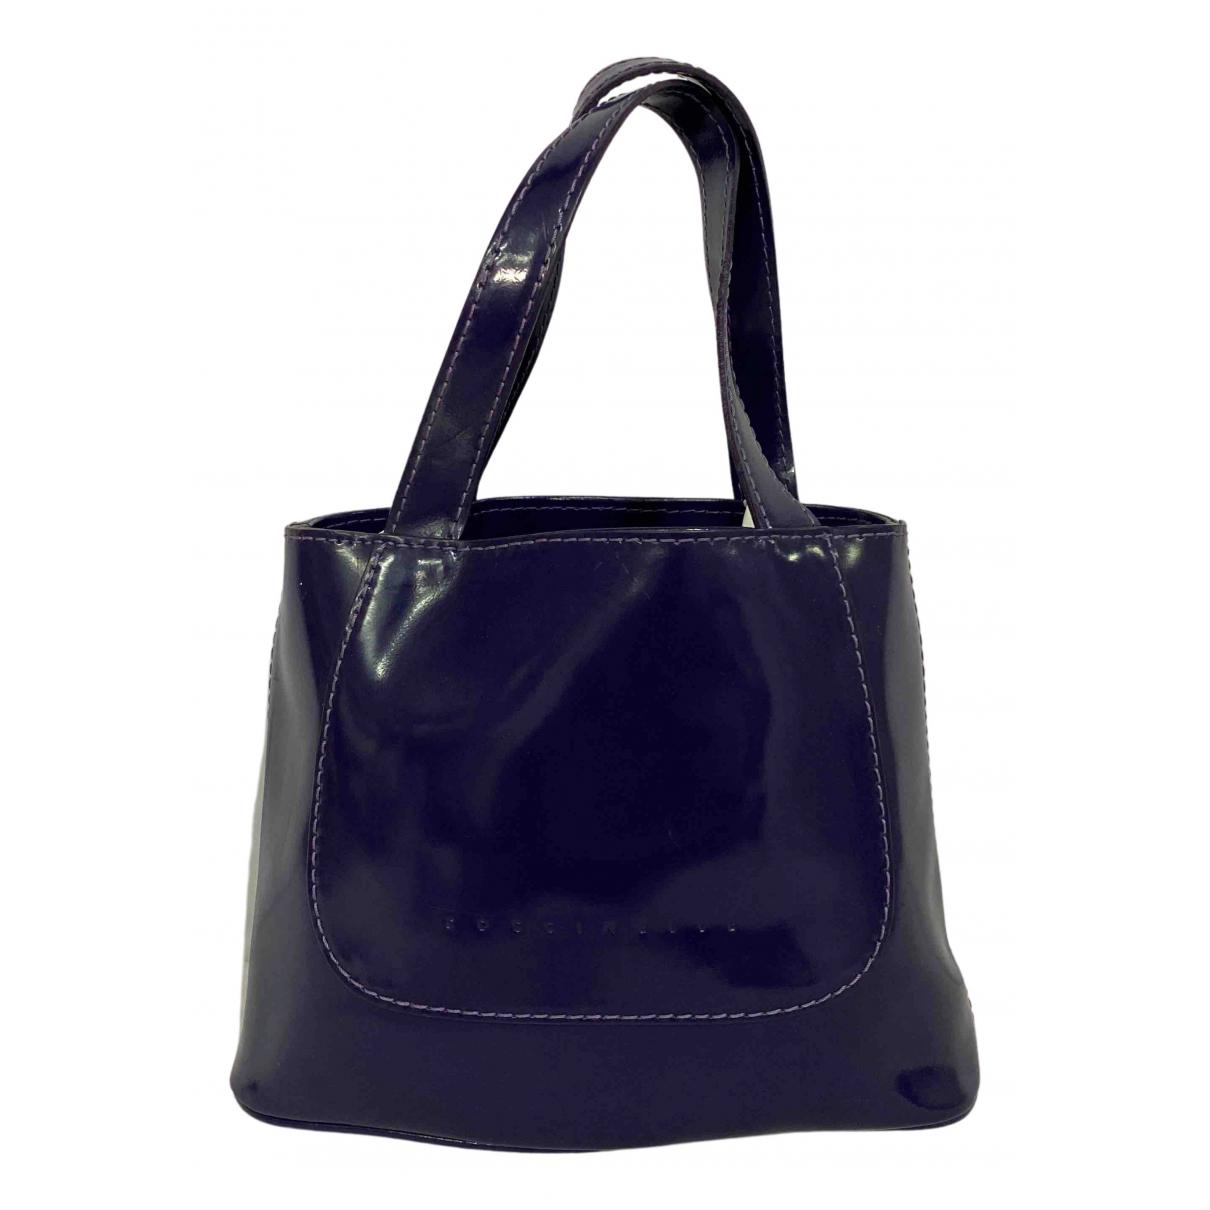 Coccinelle N Purple Leather handbag for Women N